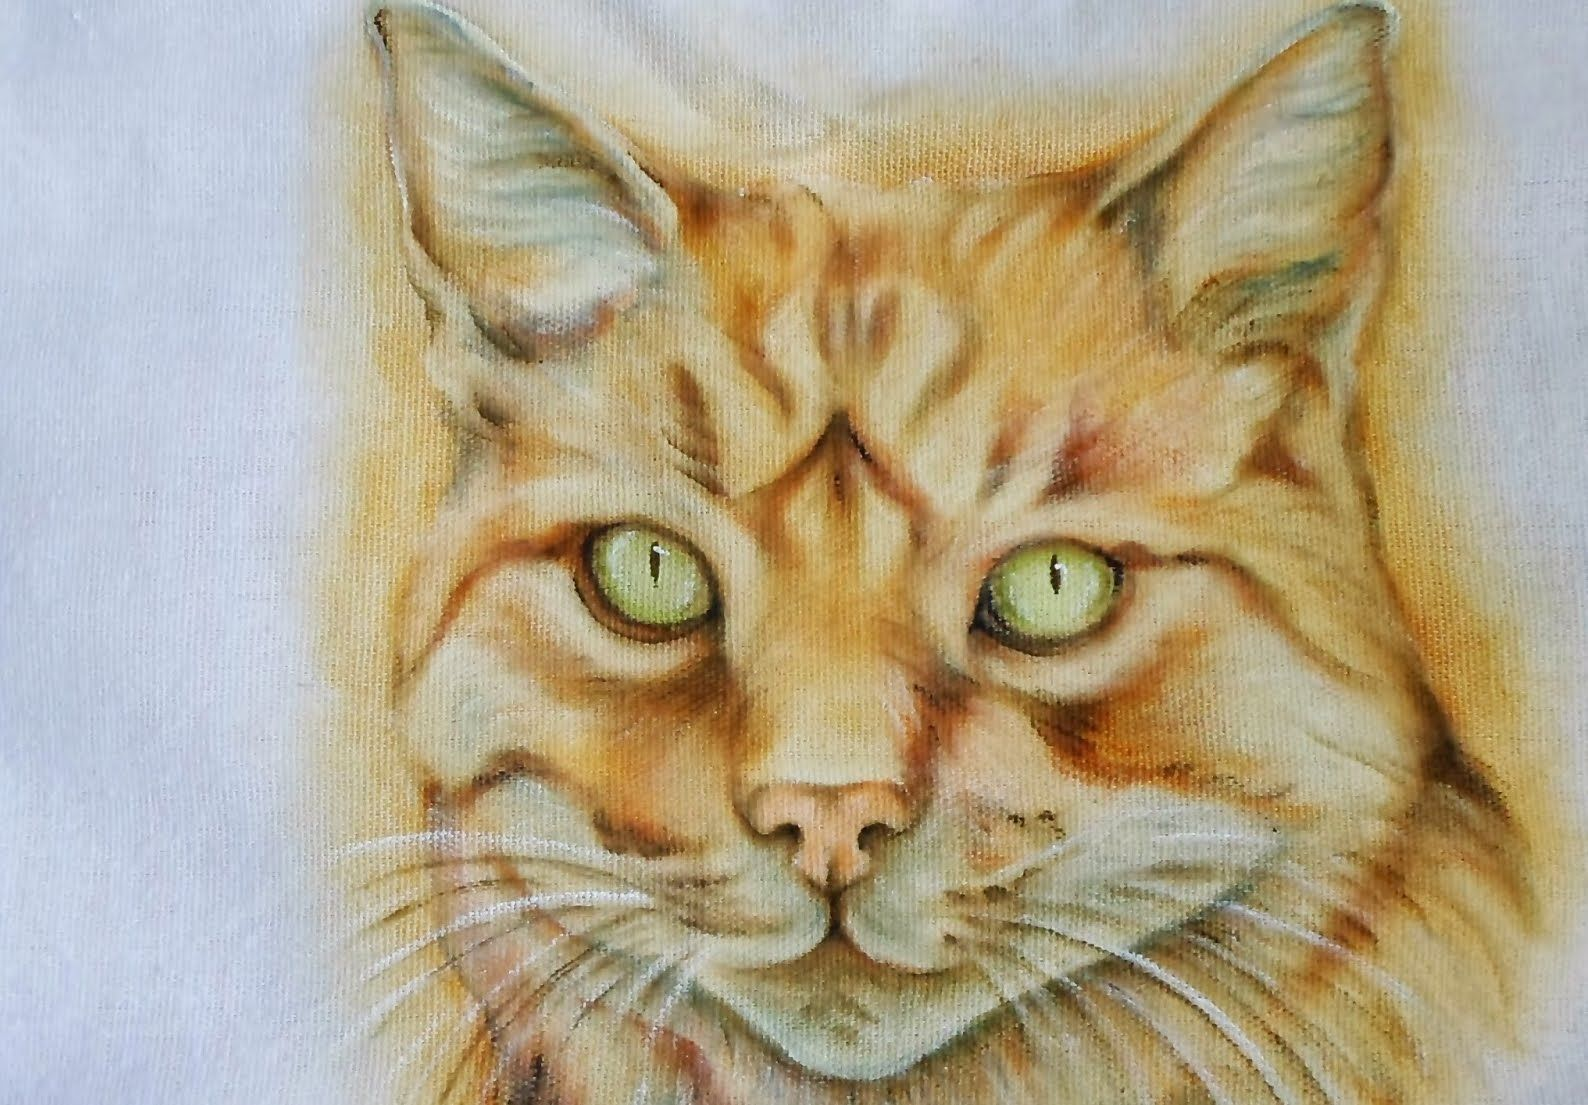 Gato Realista Pintura Em Tecido Pintura Pinterest Pintar